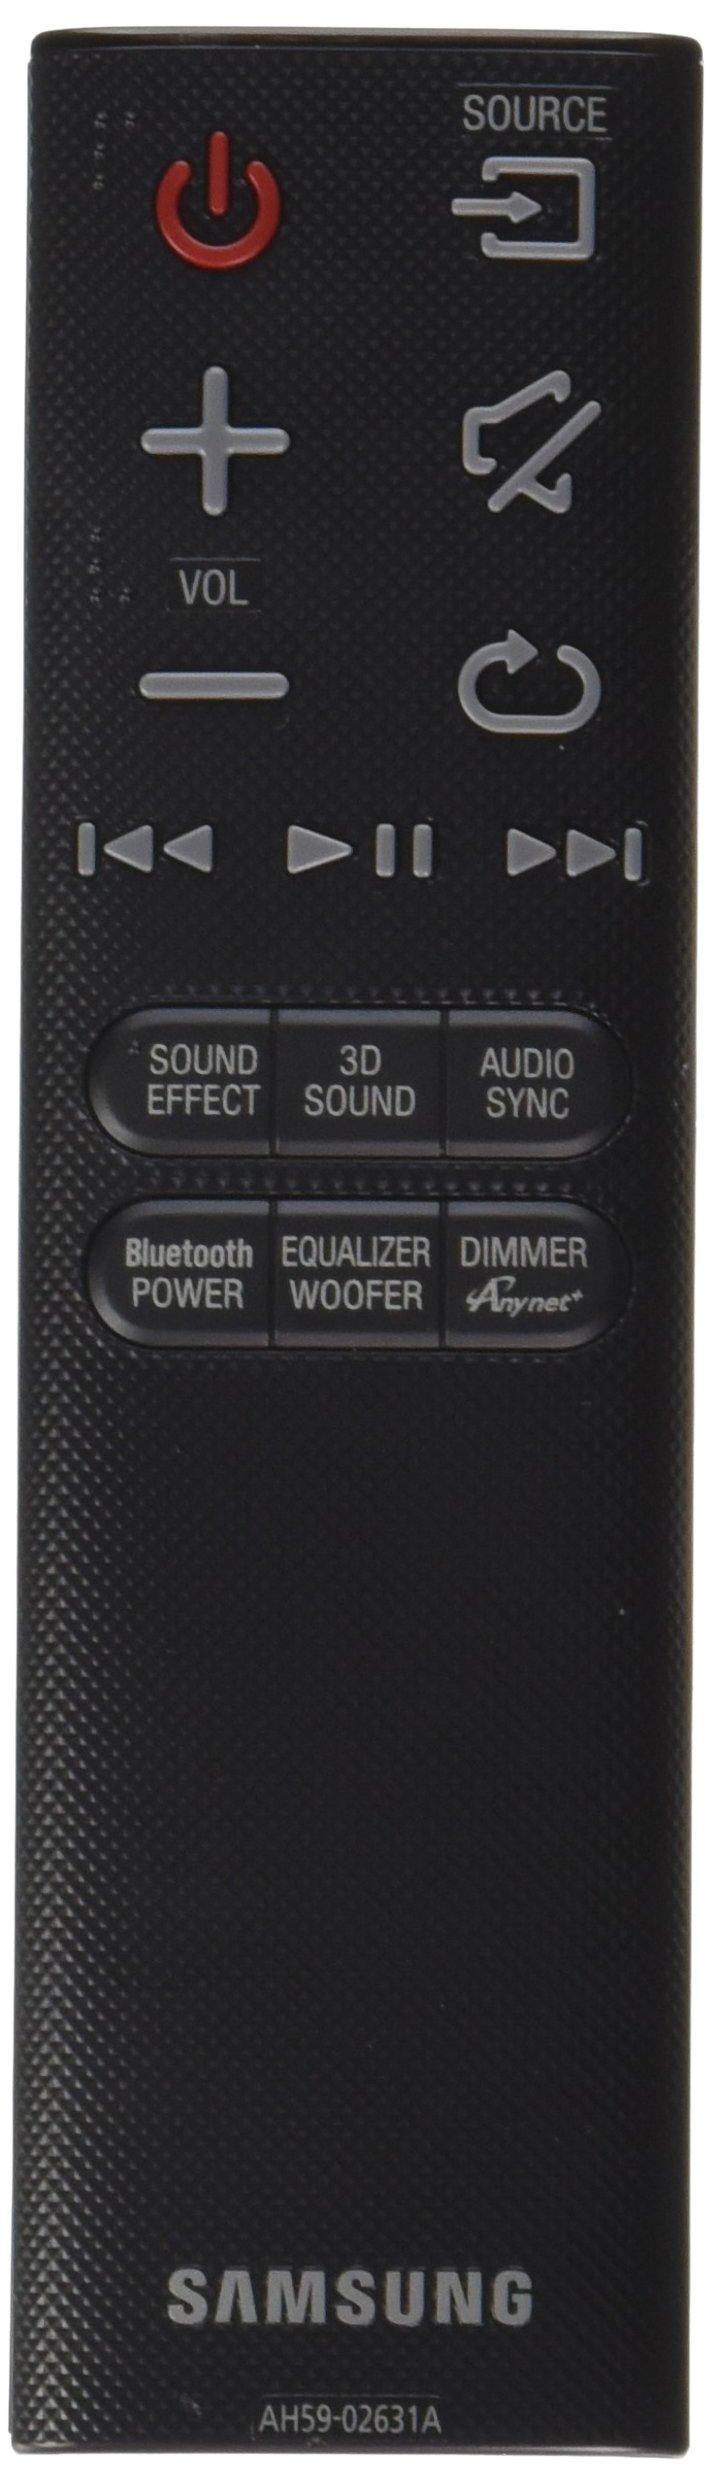 Control Remoto Samsung AH59 02631A